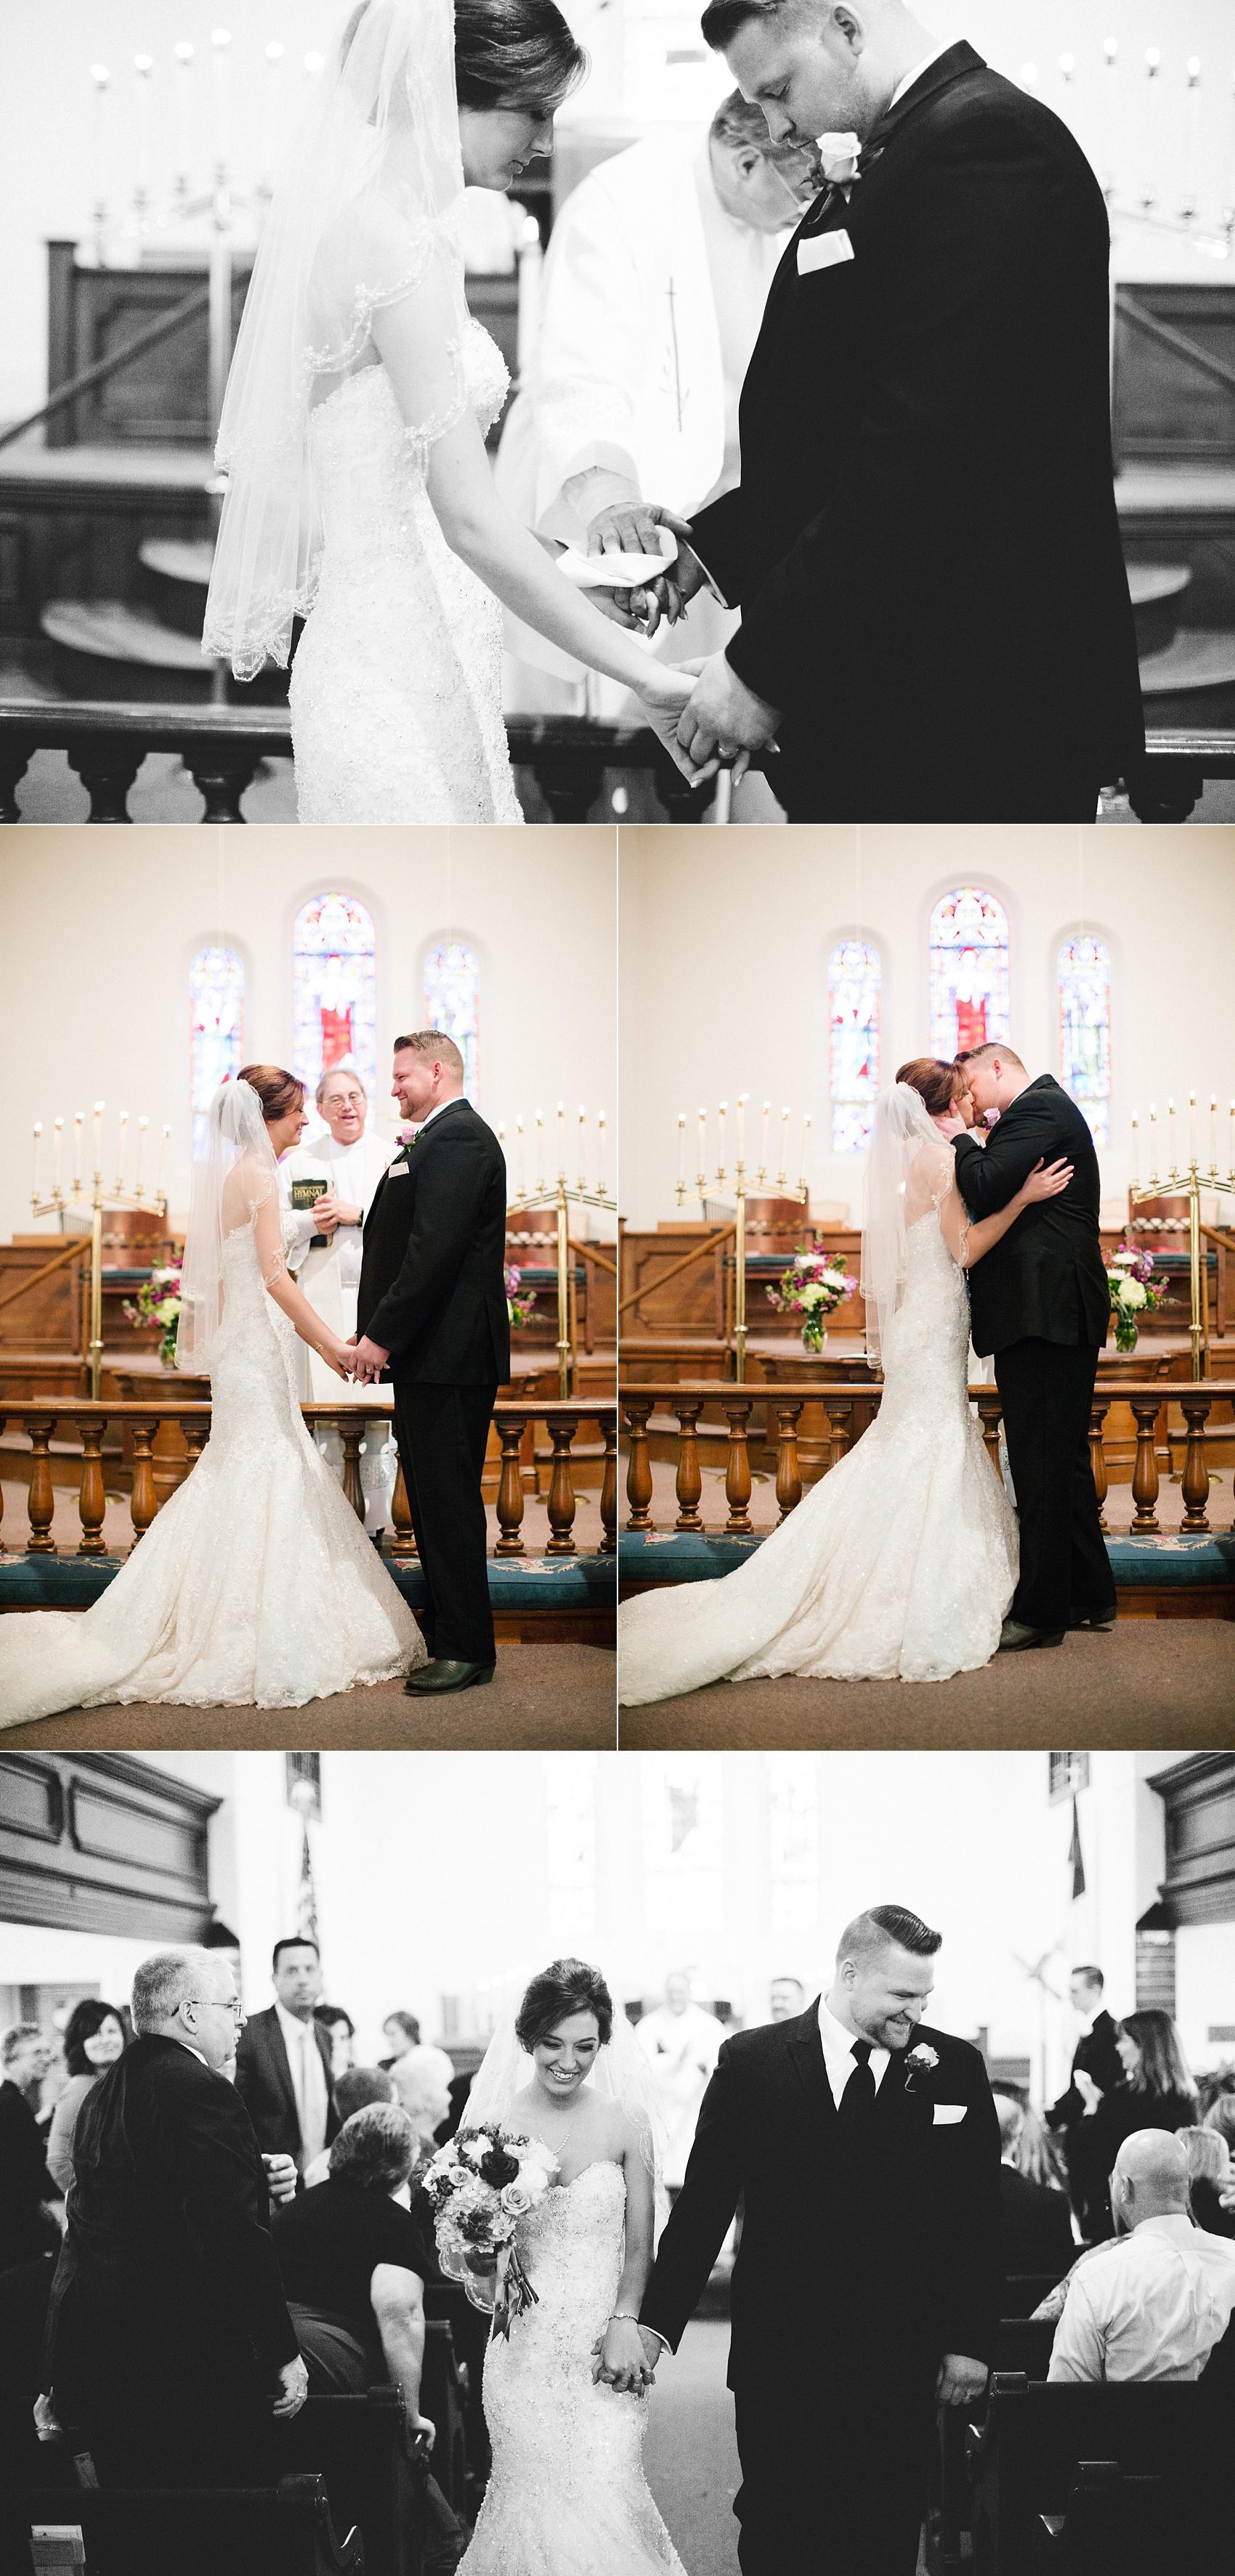 dwayne lydia delaware wedding philadelphia baltimore washingtion dc wedding photographer-14